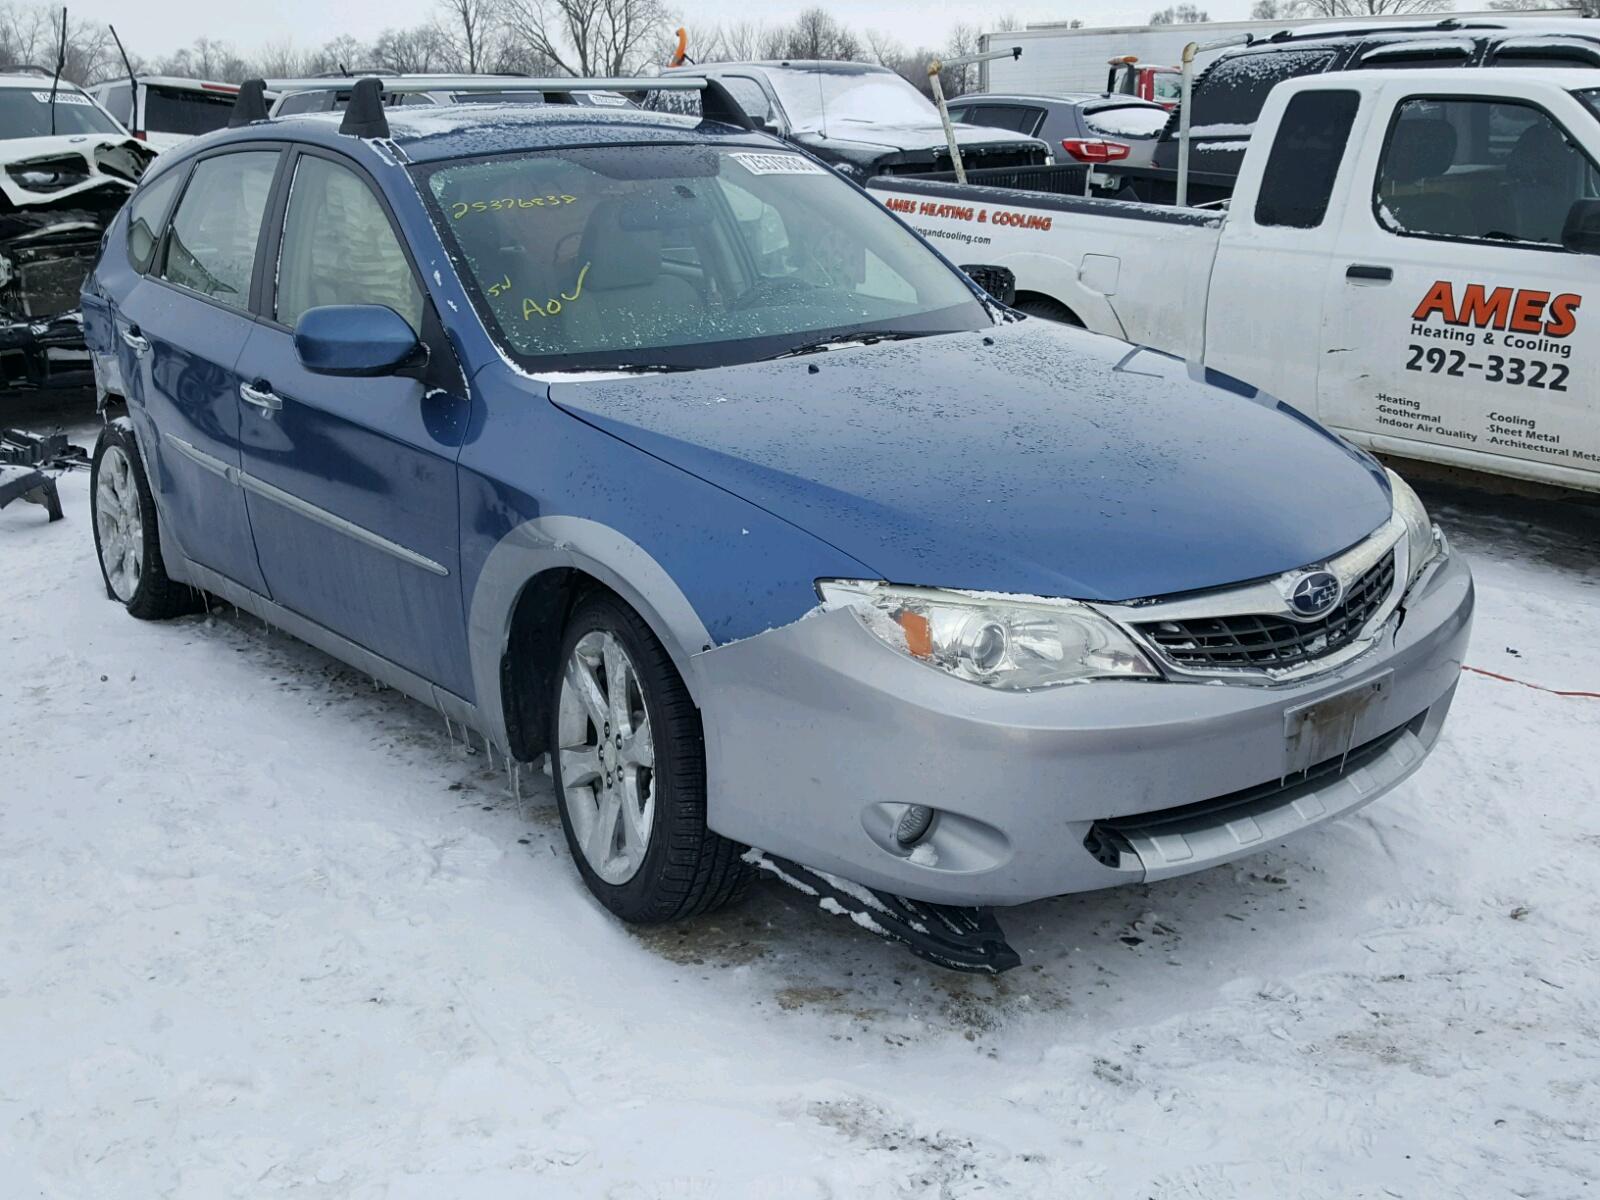 Auto Auction Ended on VIN JF1GH H 2009 SUBARU IMPREZA OU